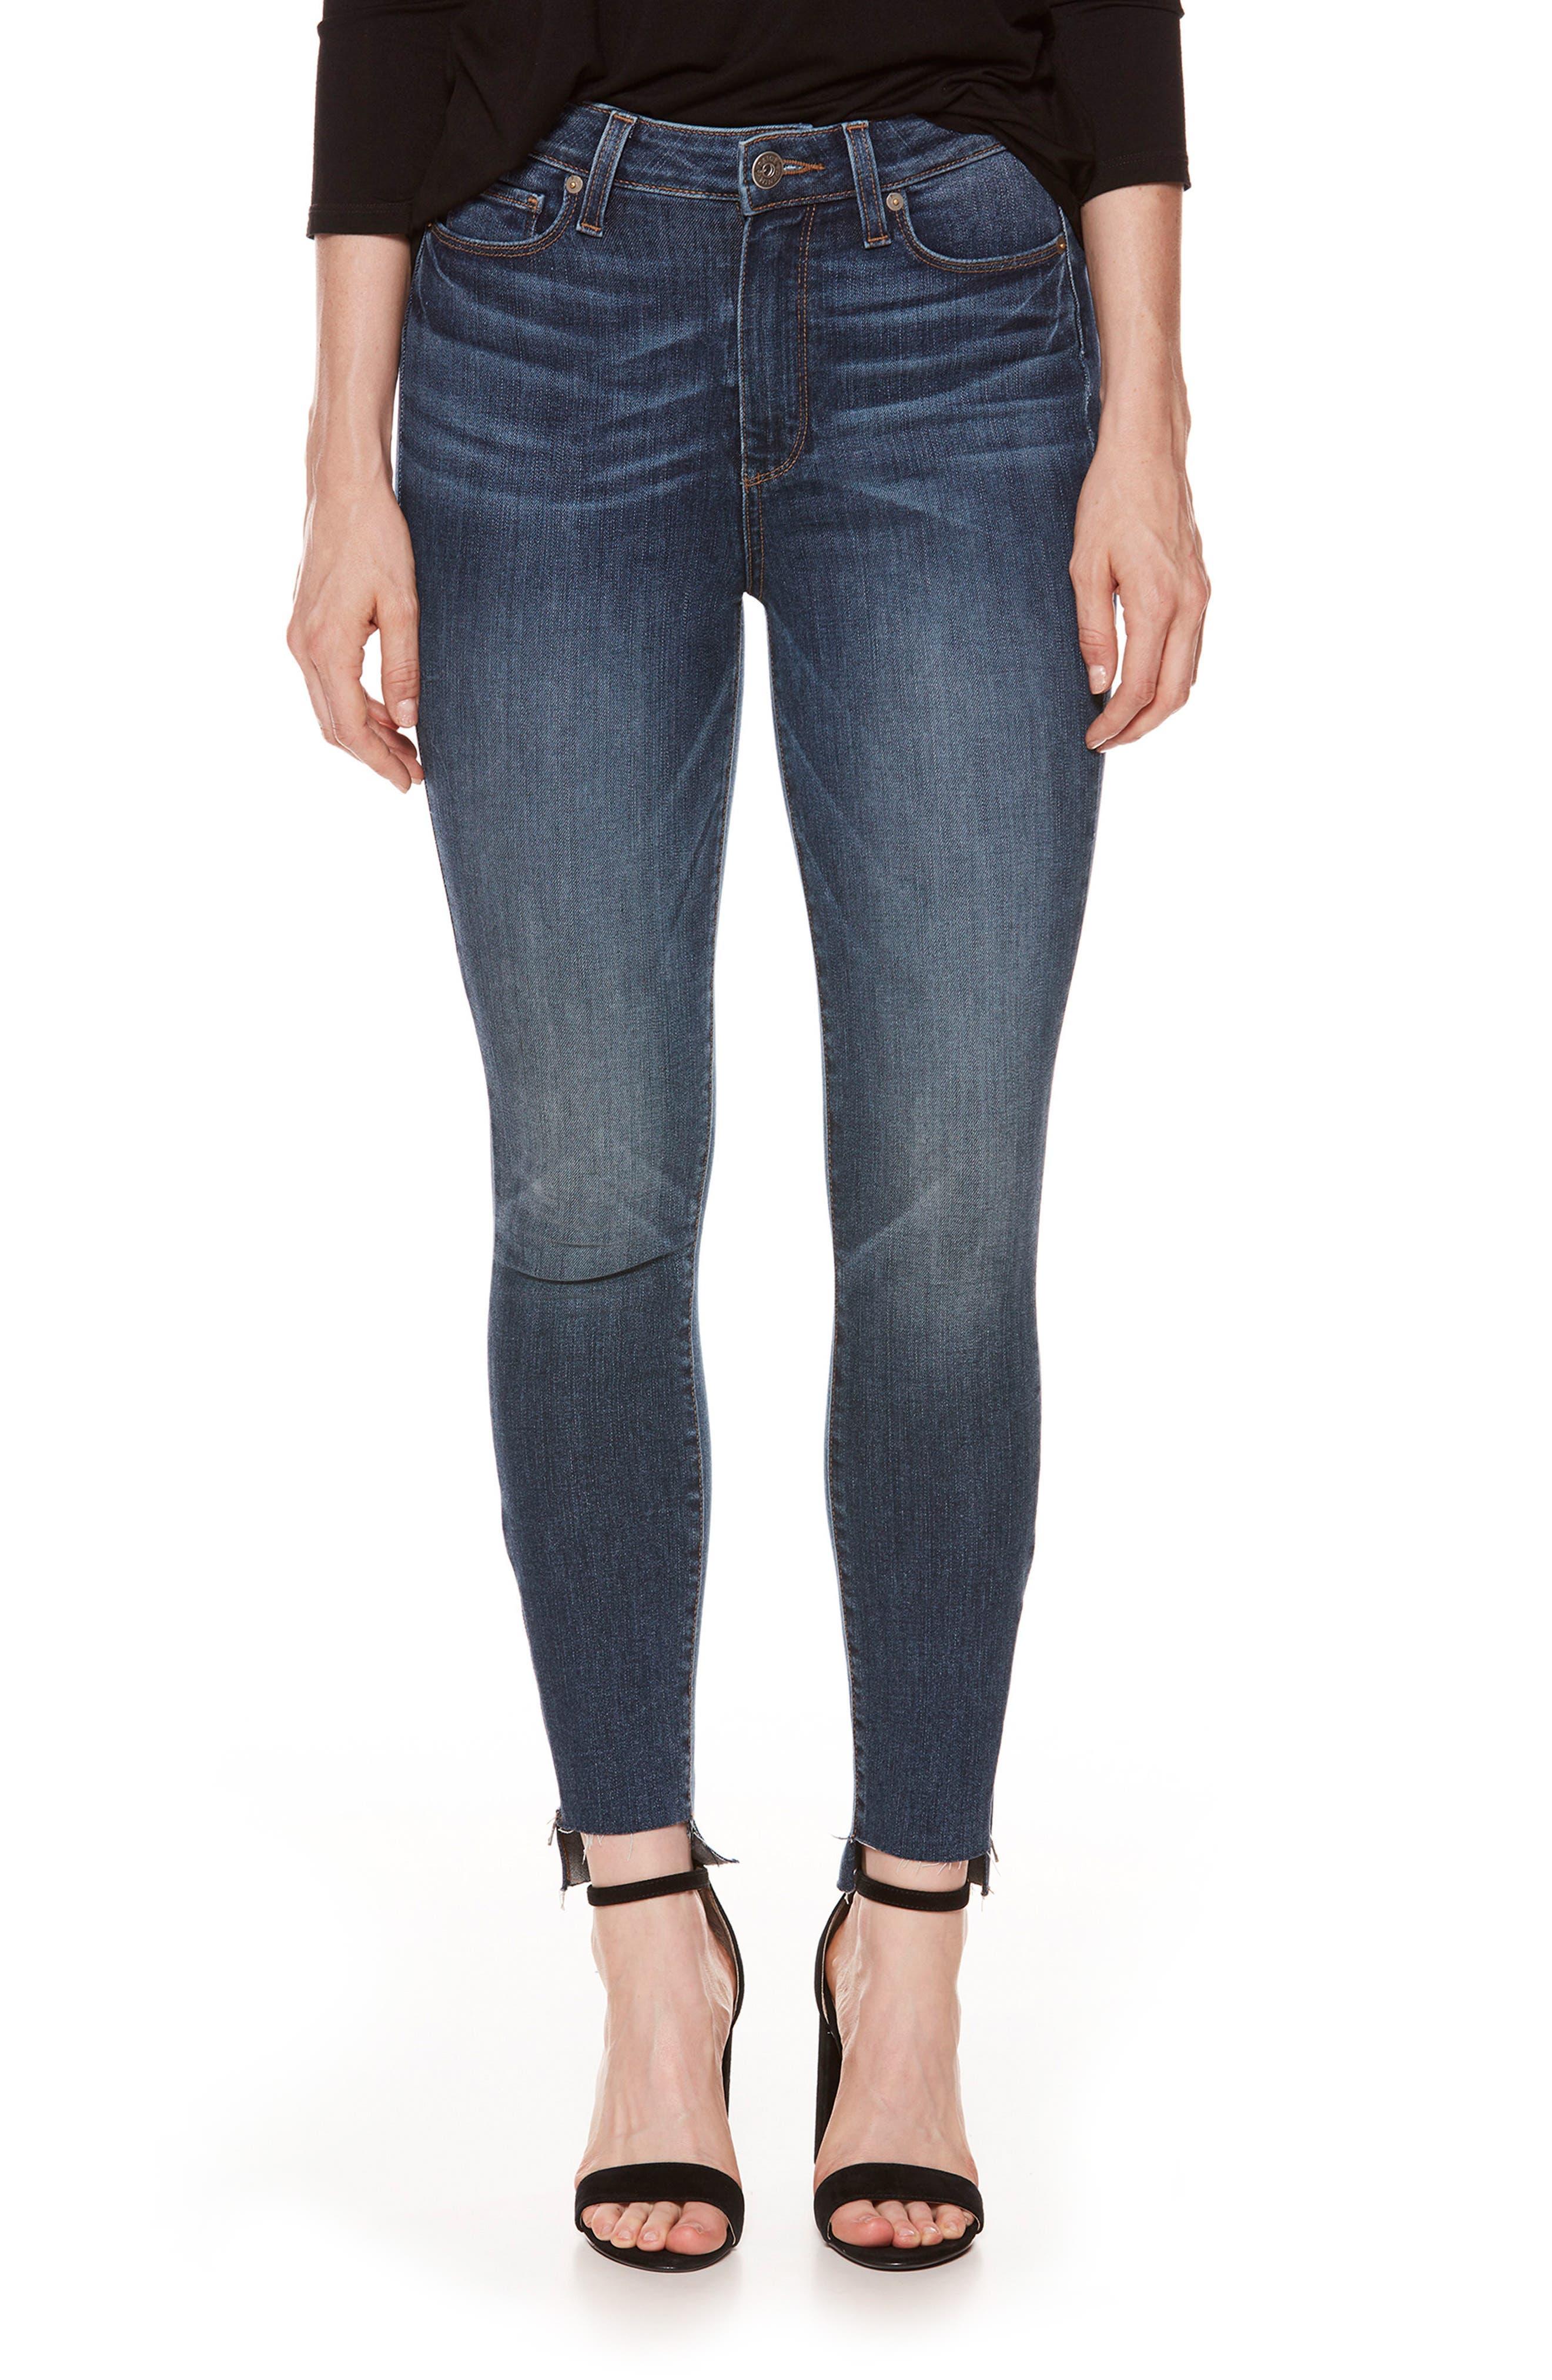 Main Image - PAIGE Margot High Waist Zip Skinny Jeans (Westminster)